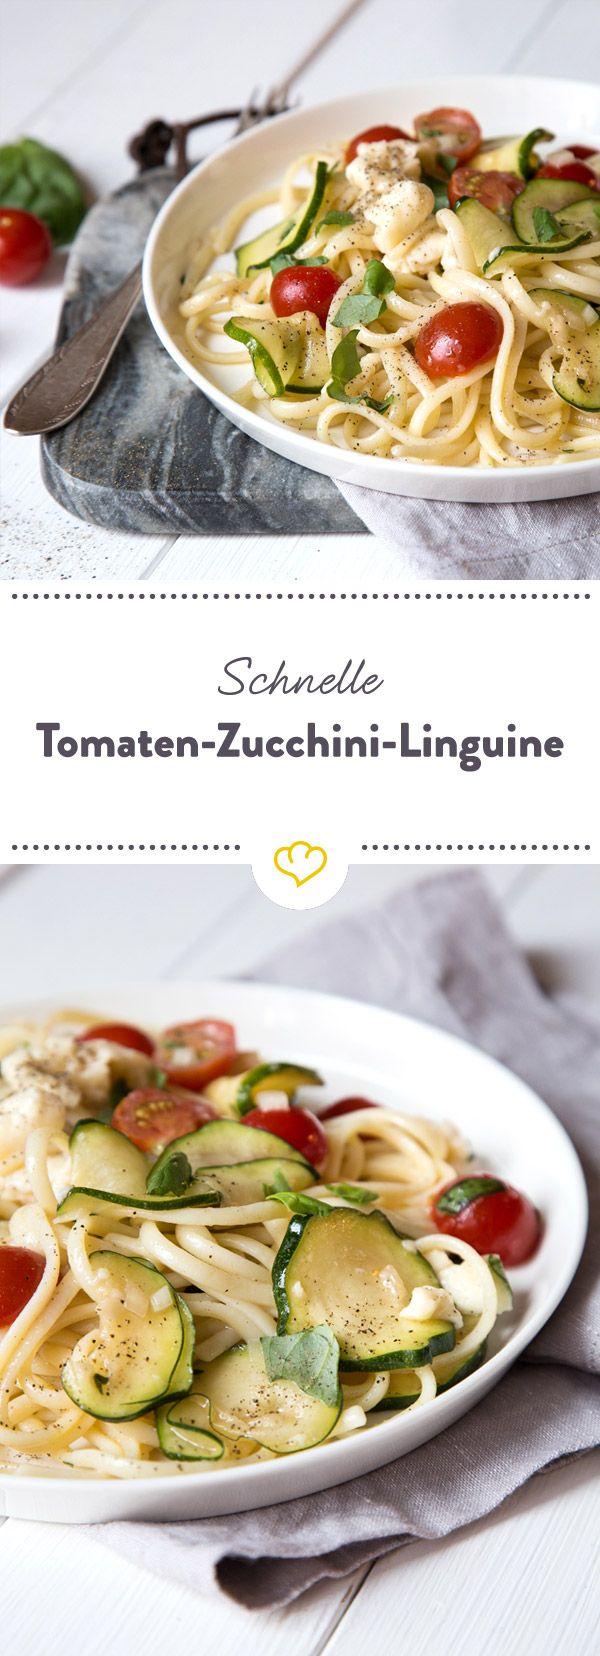 Linguine, Quick Dinner Recipes, Petra, Rabbit, Lasagne, Pasta Noodles,  Mozzarella, Food Cakes, Meal Prep